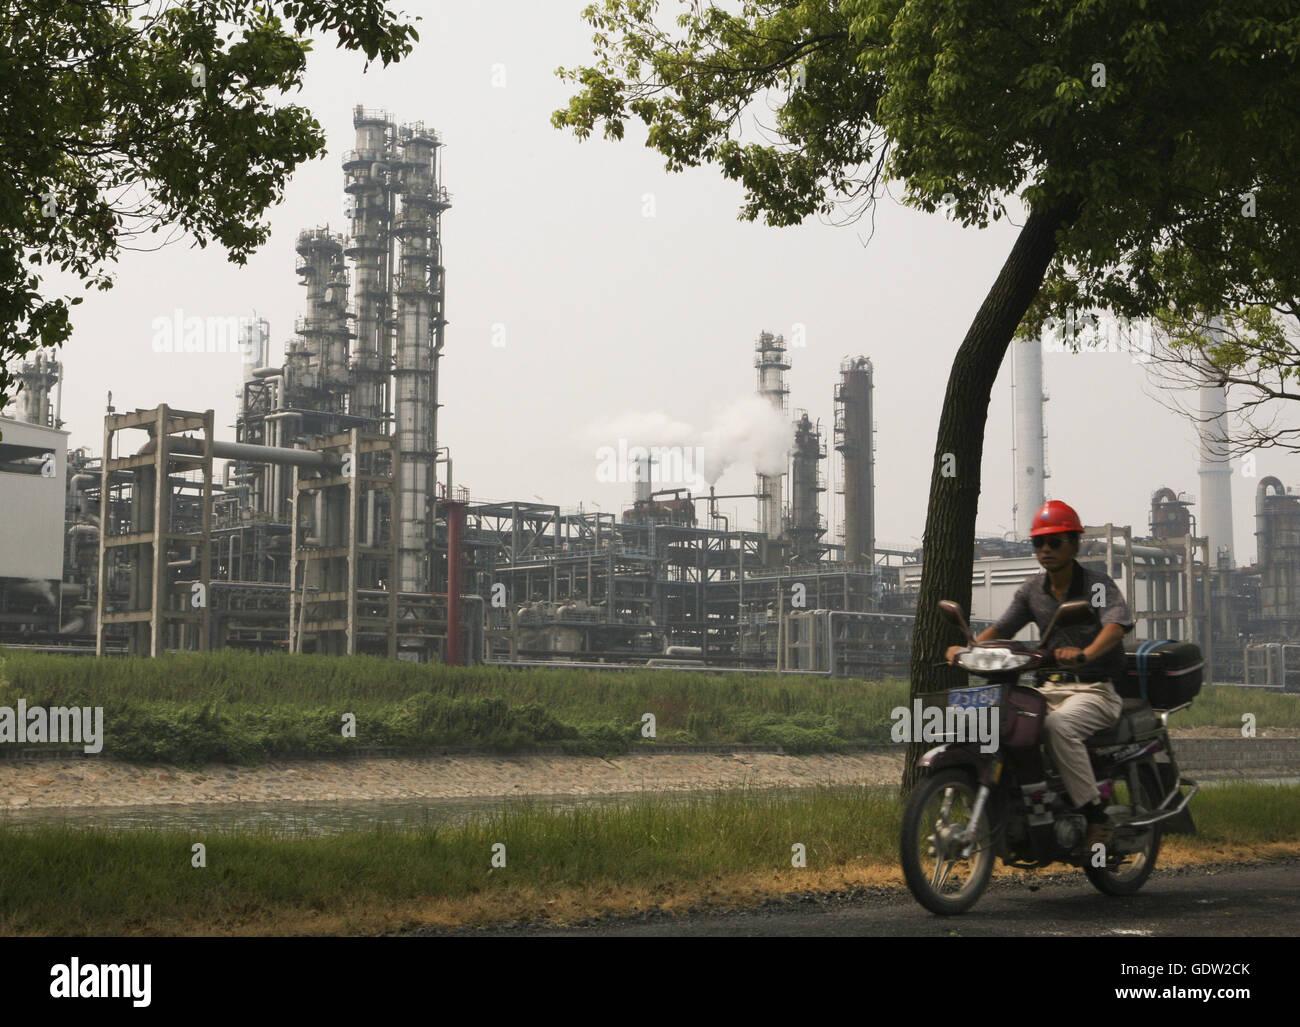 Sinopec Shanghai Petrochemical Company Limited Spc Stock